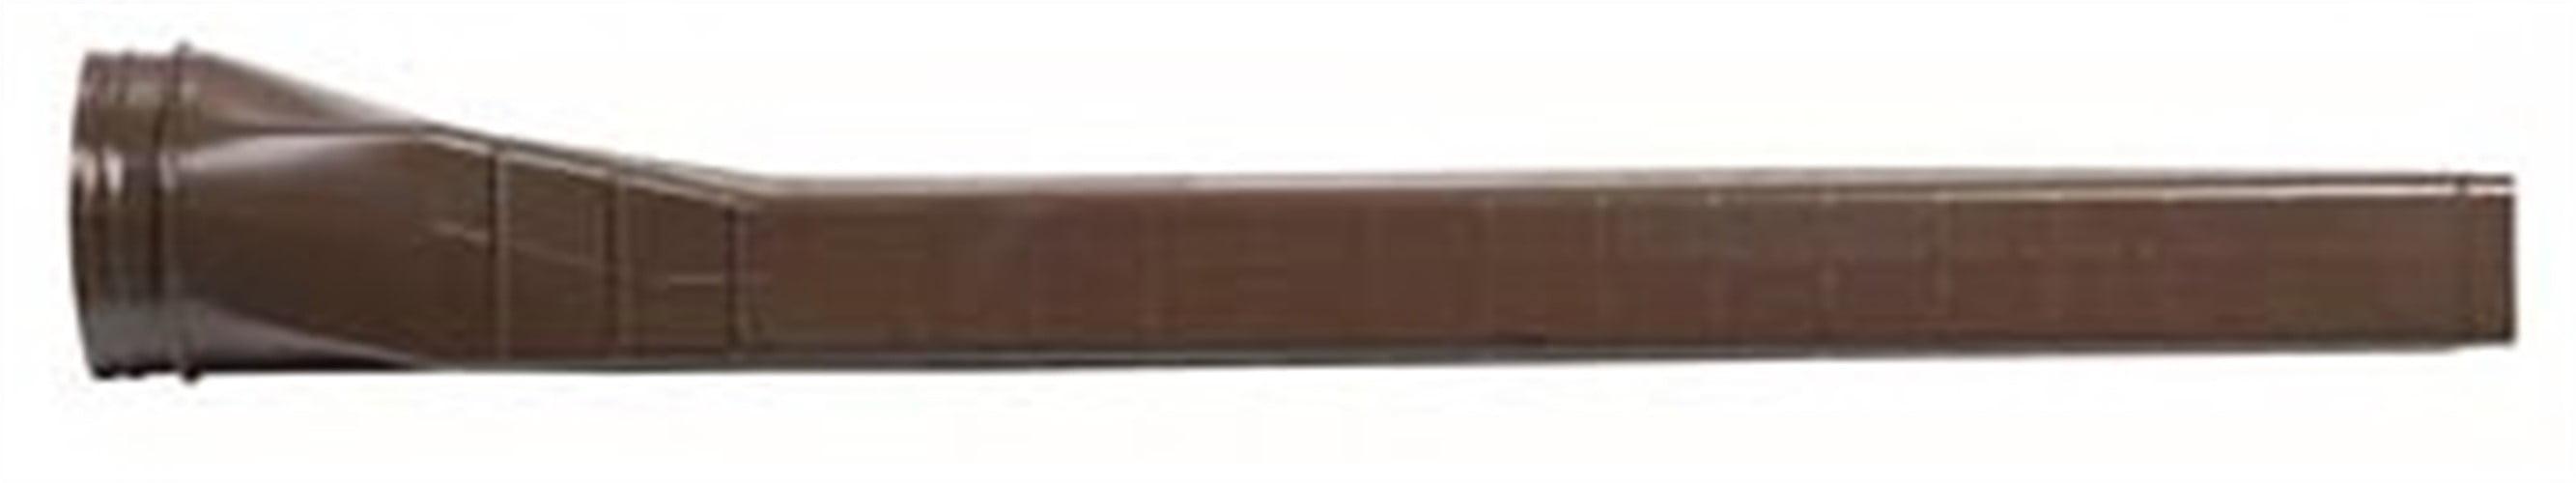 Brown Flex-Drain 88219A Covered Splash Block